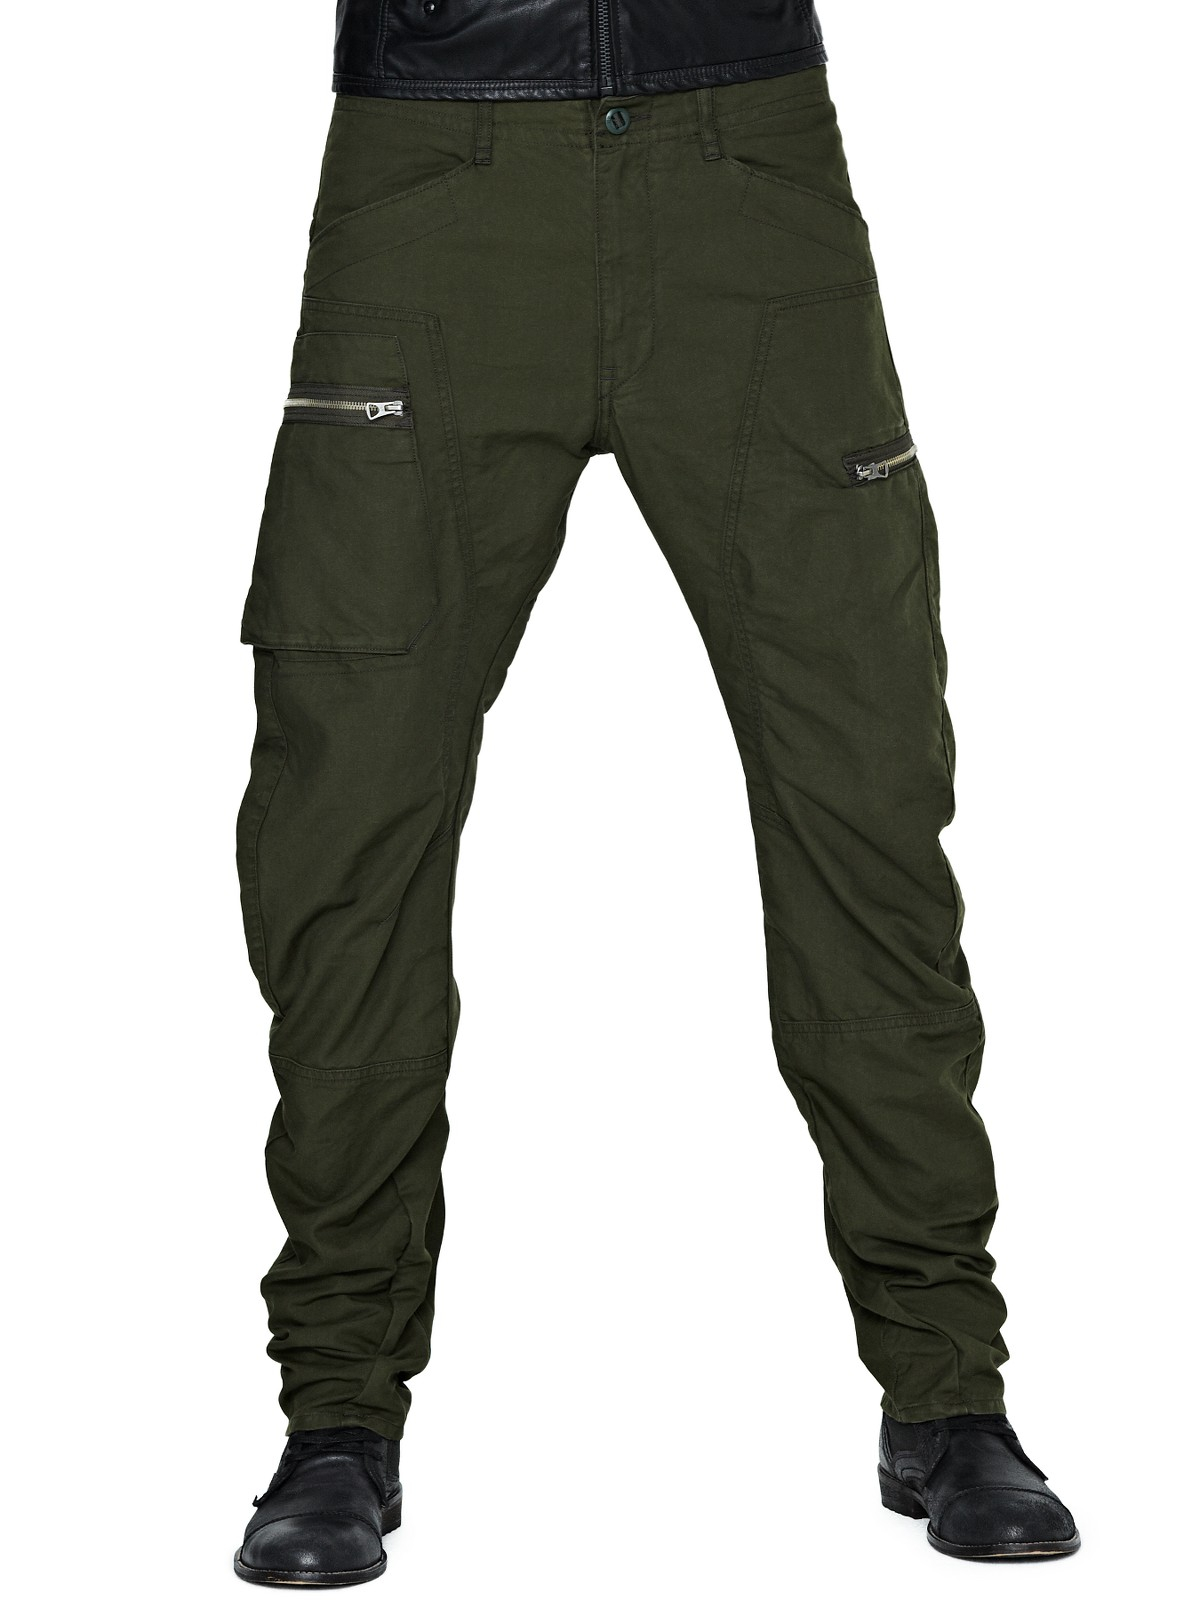 G Star Raw Gstar Raw Powel 3d Mens Tapered Cargo Trousers